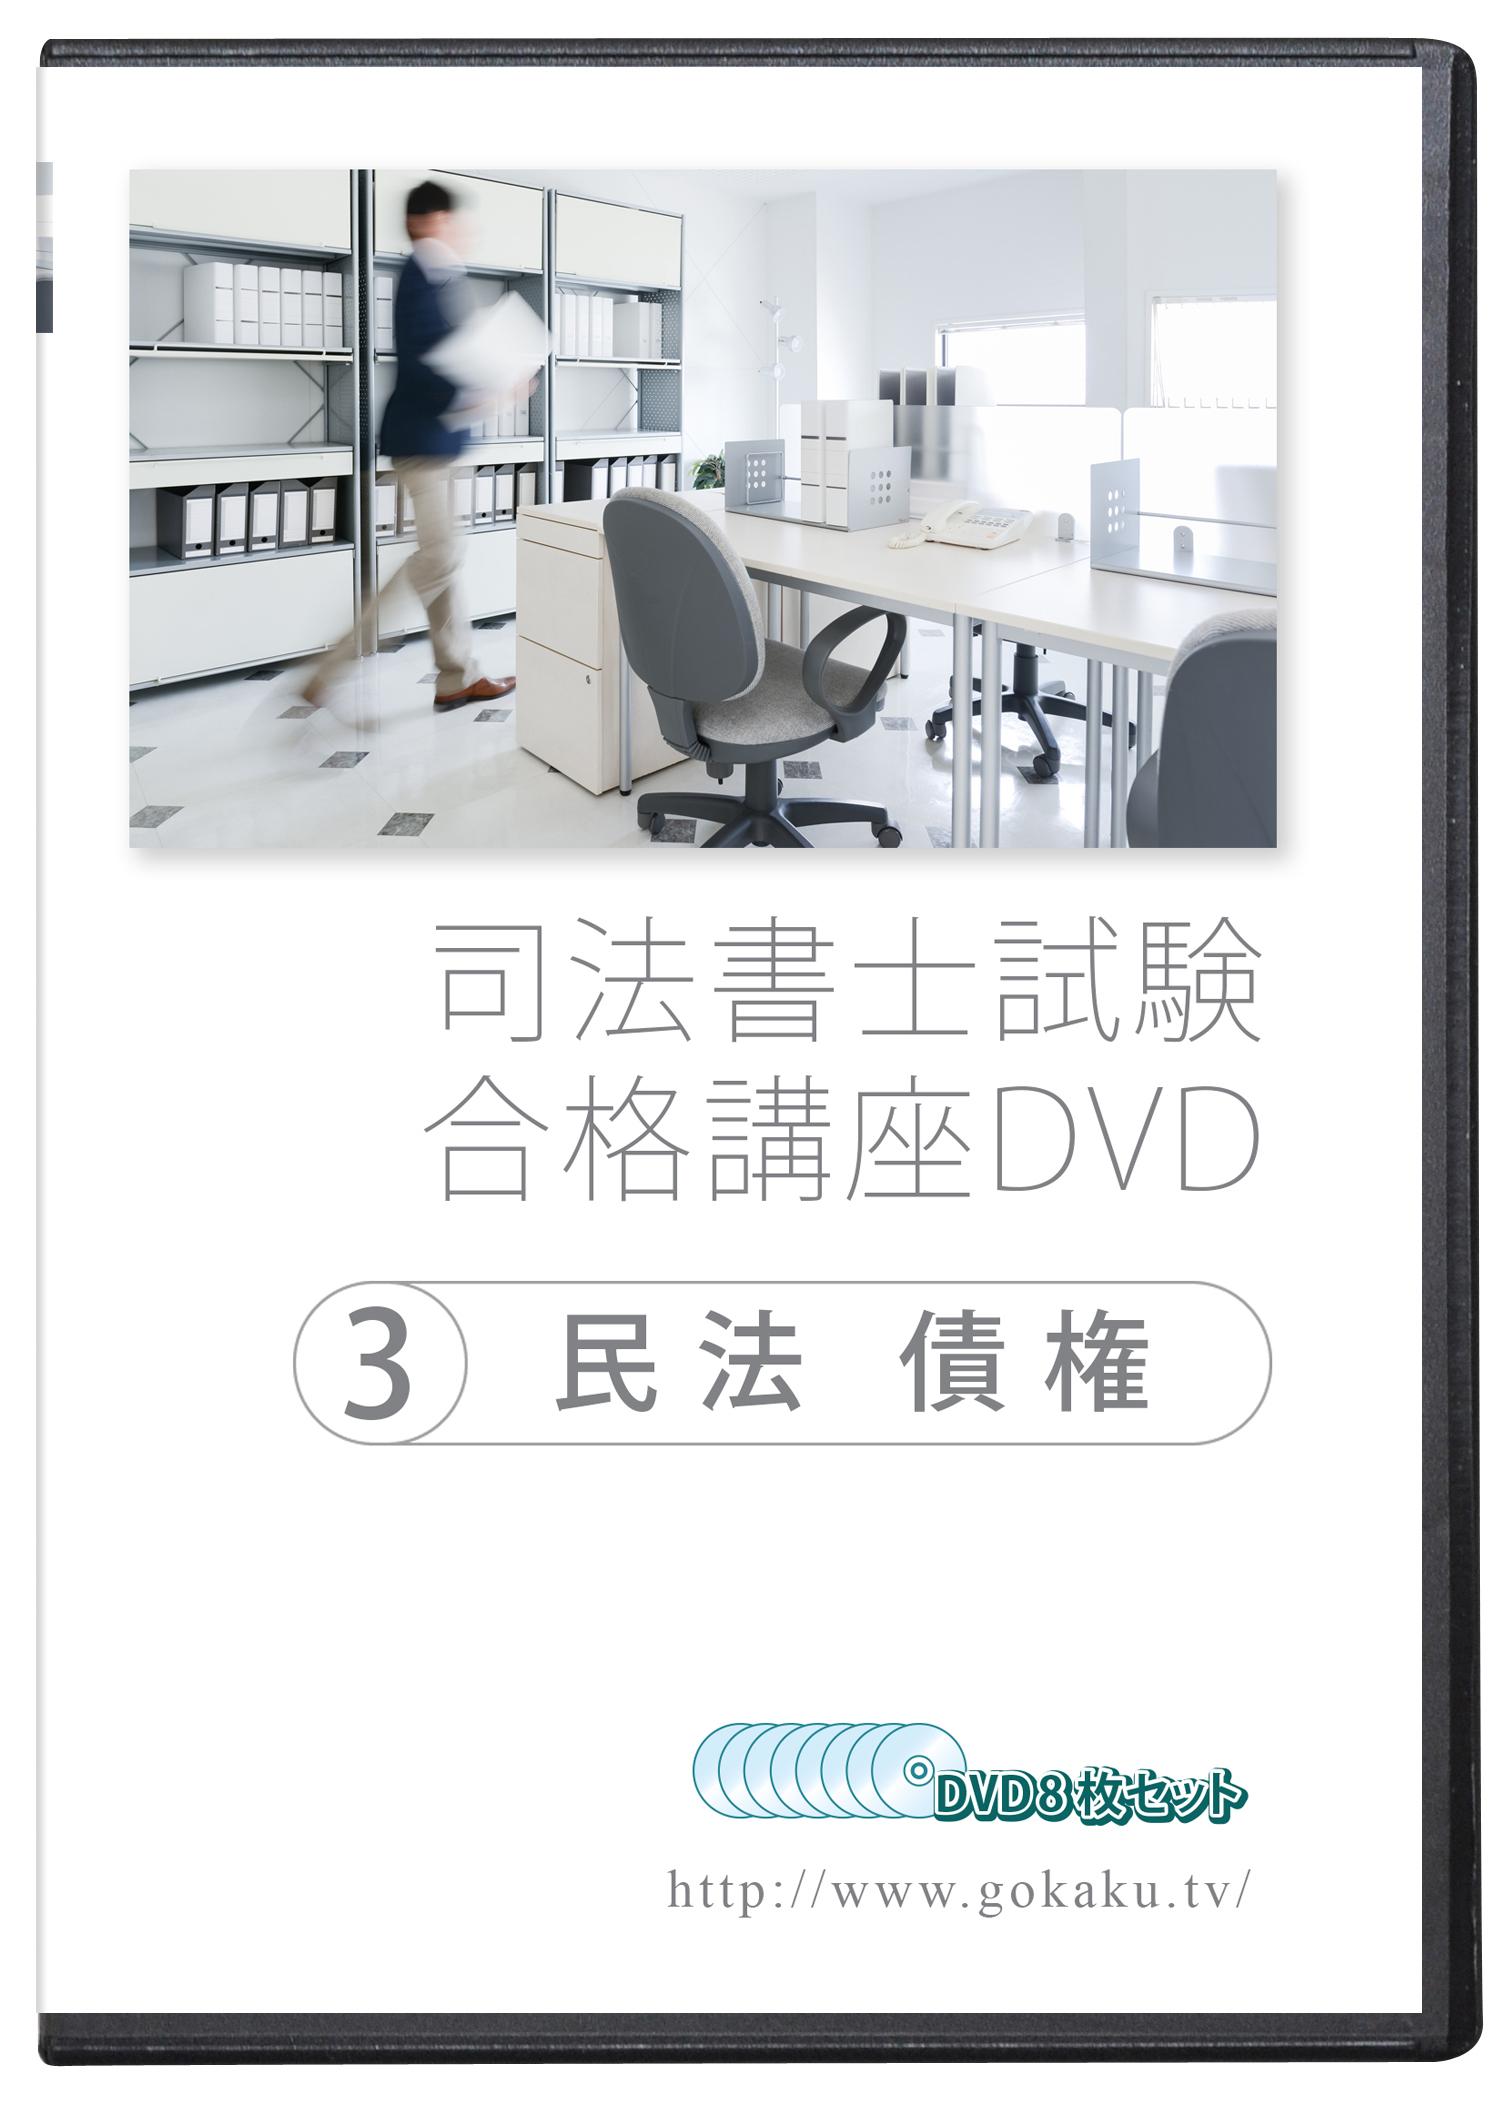 2021-2022年 司法書士試験合格講座DVD 3民法債権 DVD8枚セット PDF 『1年保証』 新作製品 世界最高品質人気 テキスト付き